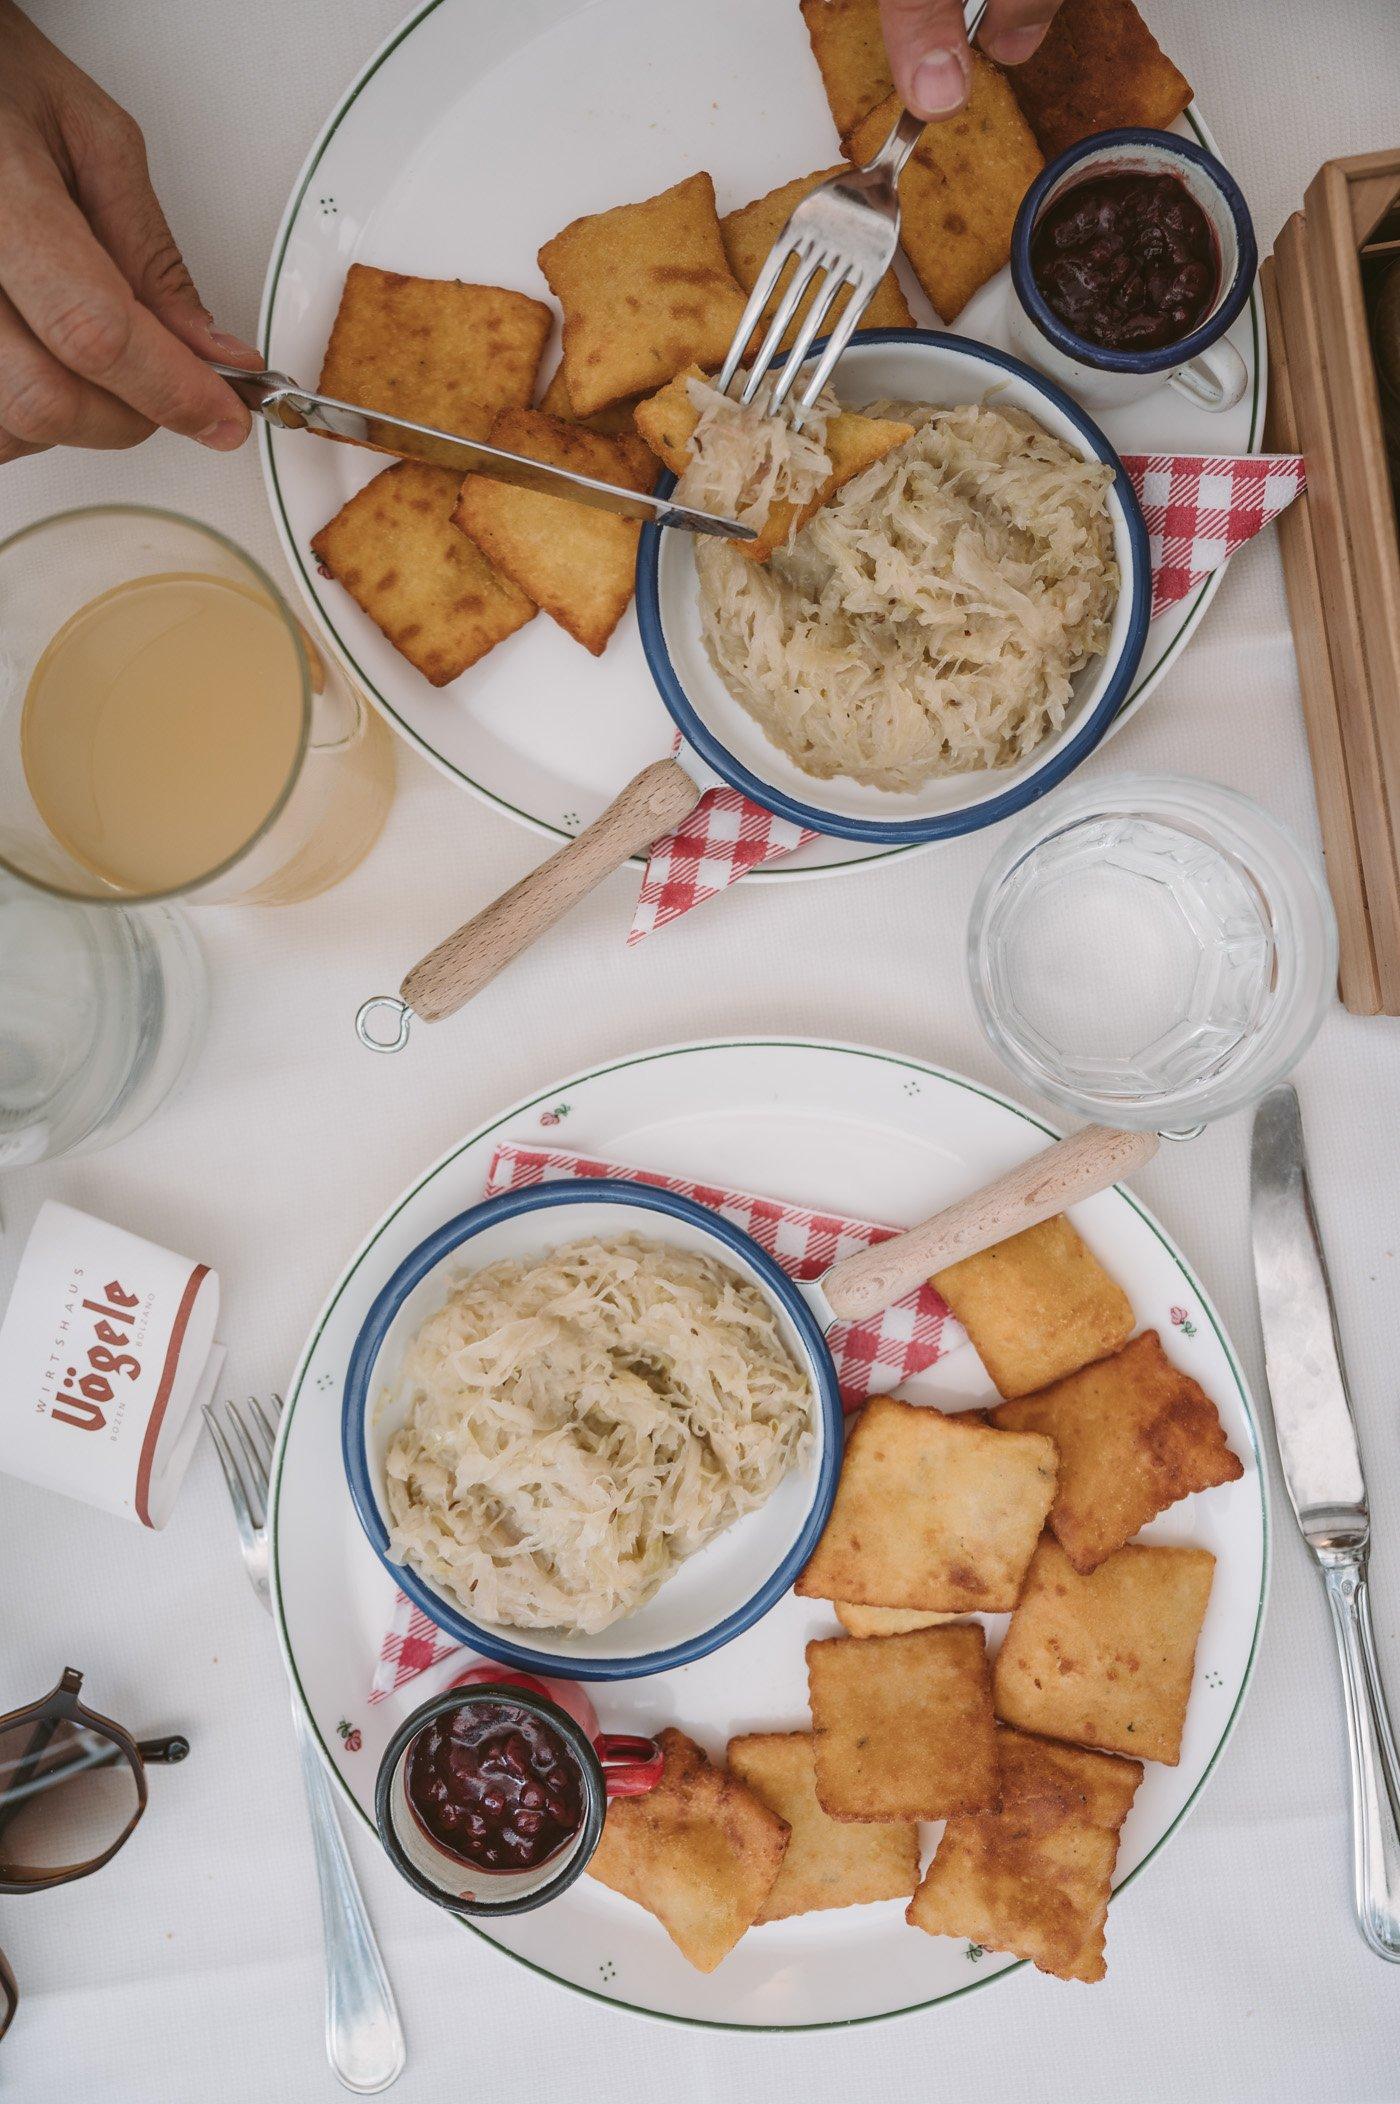 Kartoffelblattln at Restaurant Vögele in Bolzano